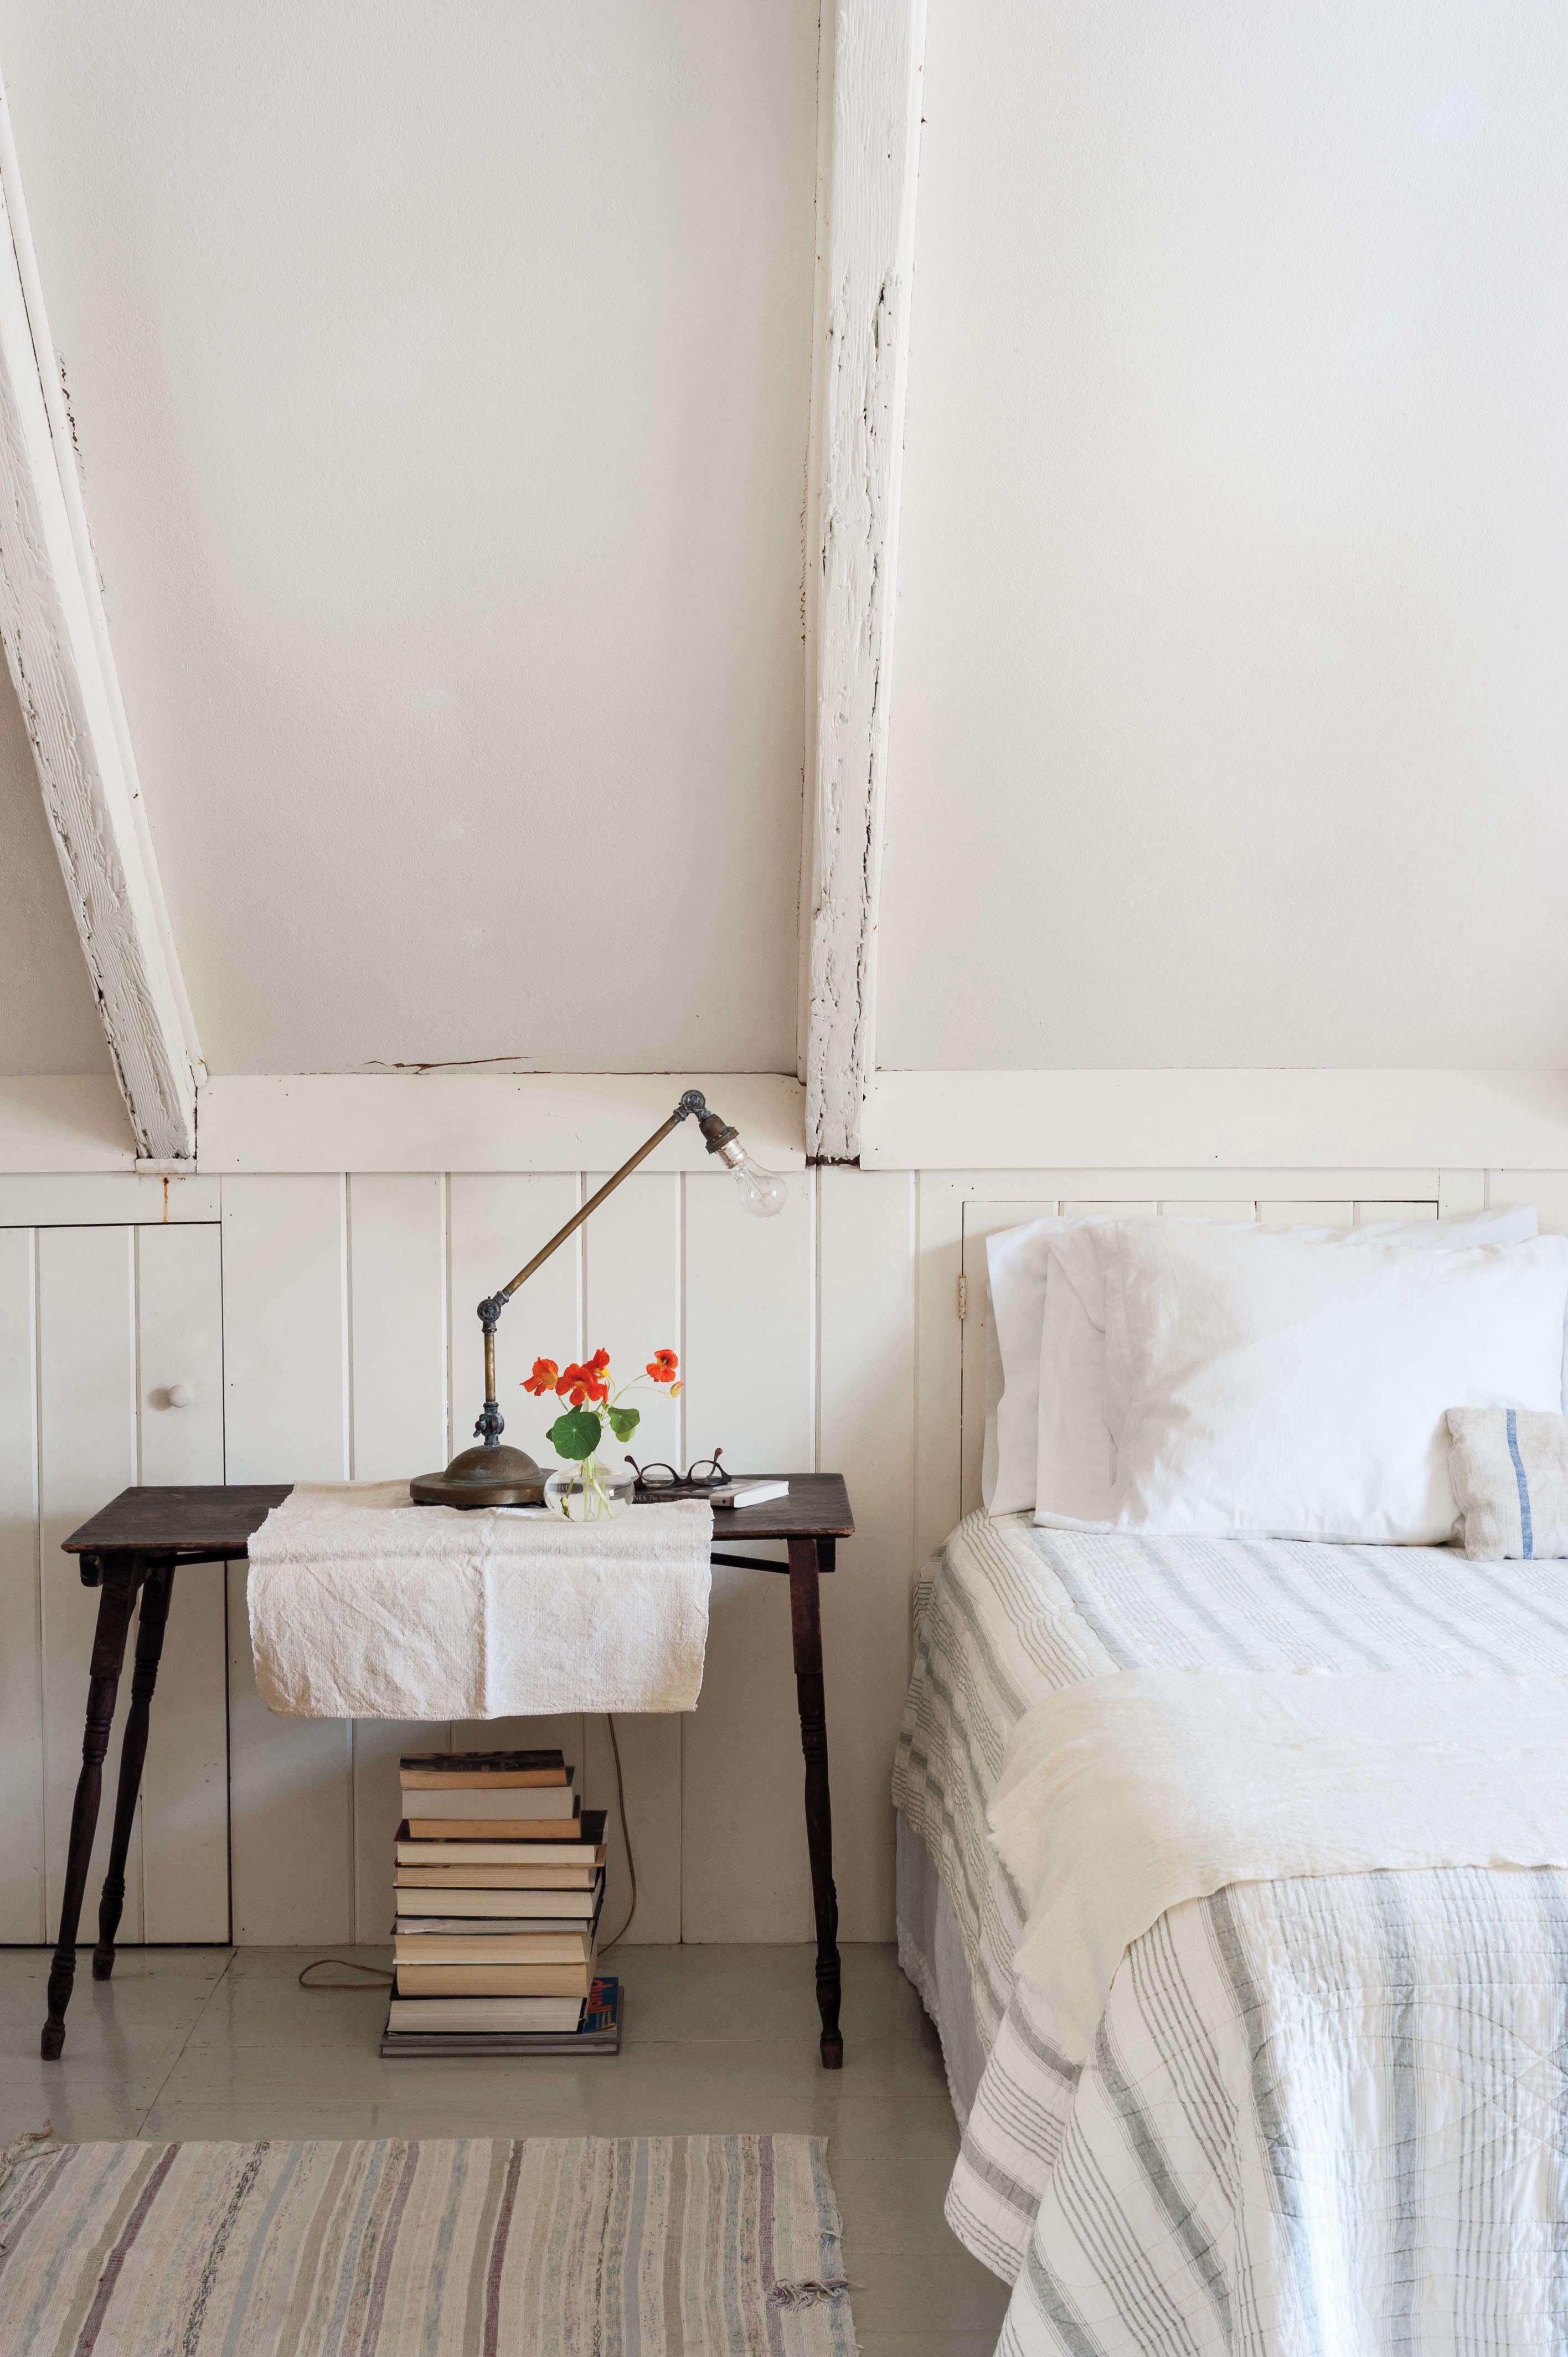 Justine Hand's Cape Cod Bedroom